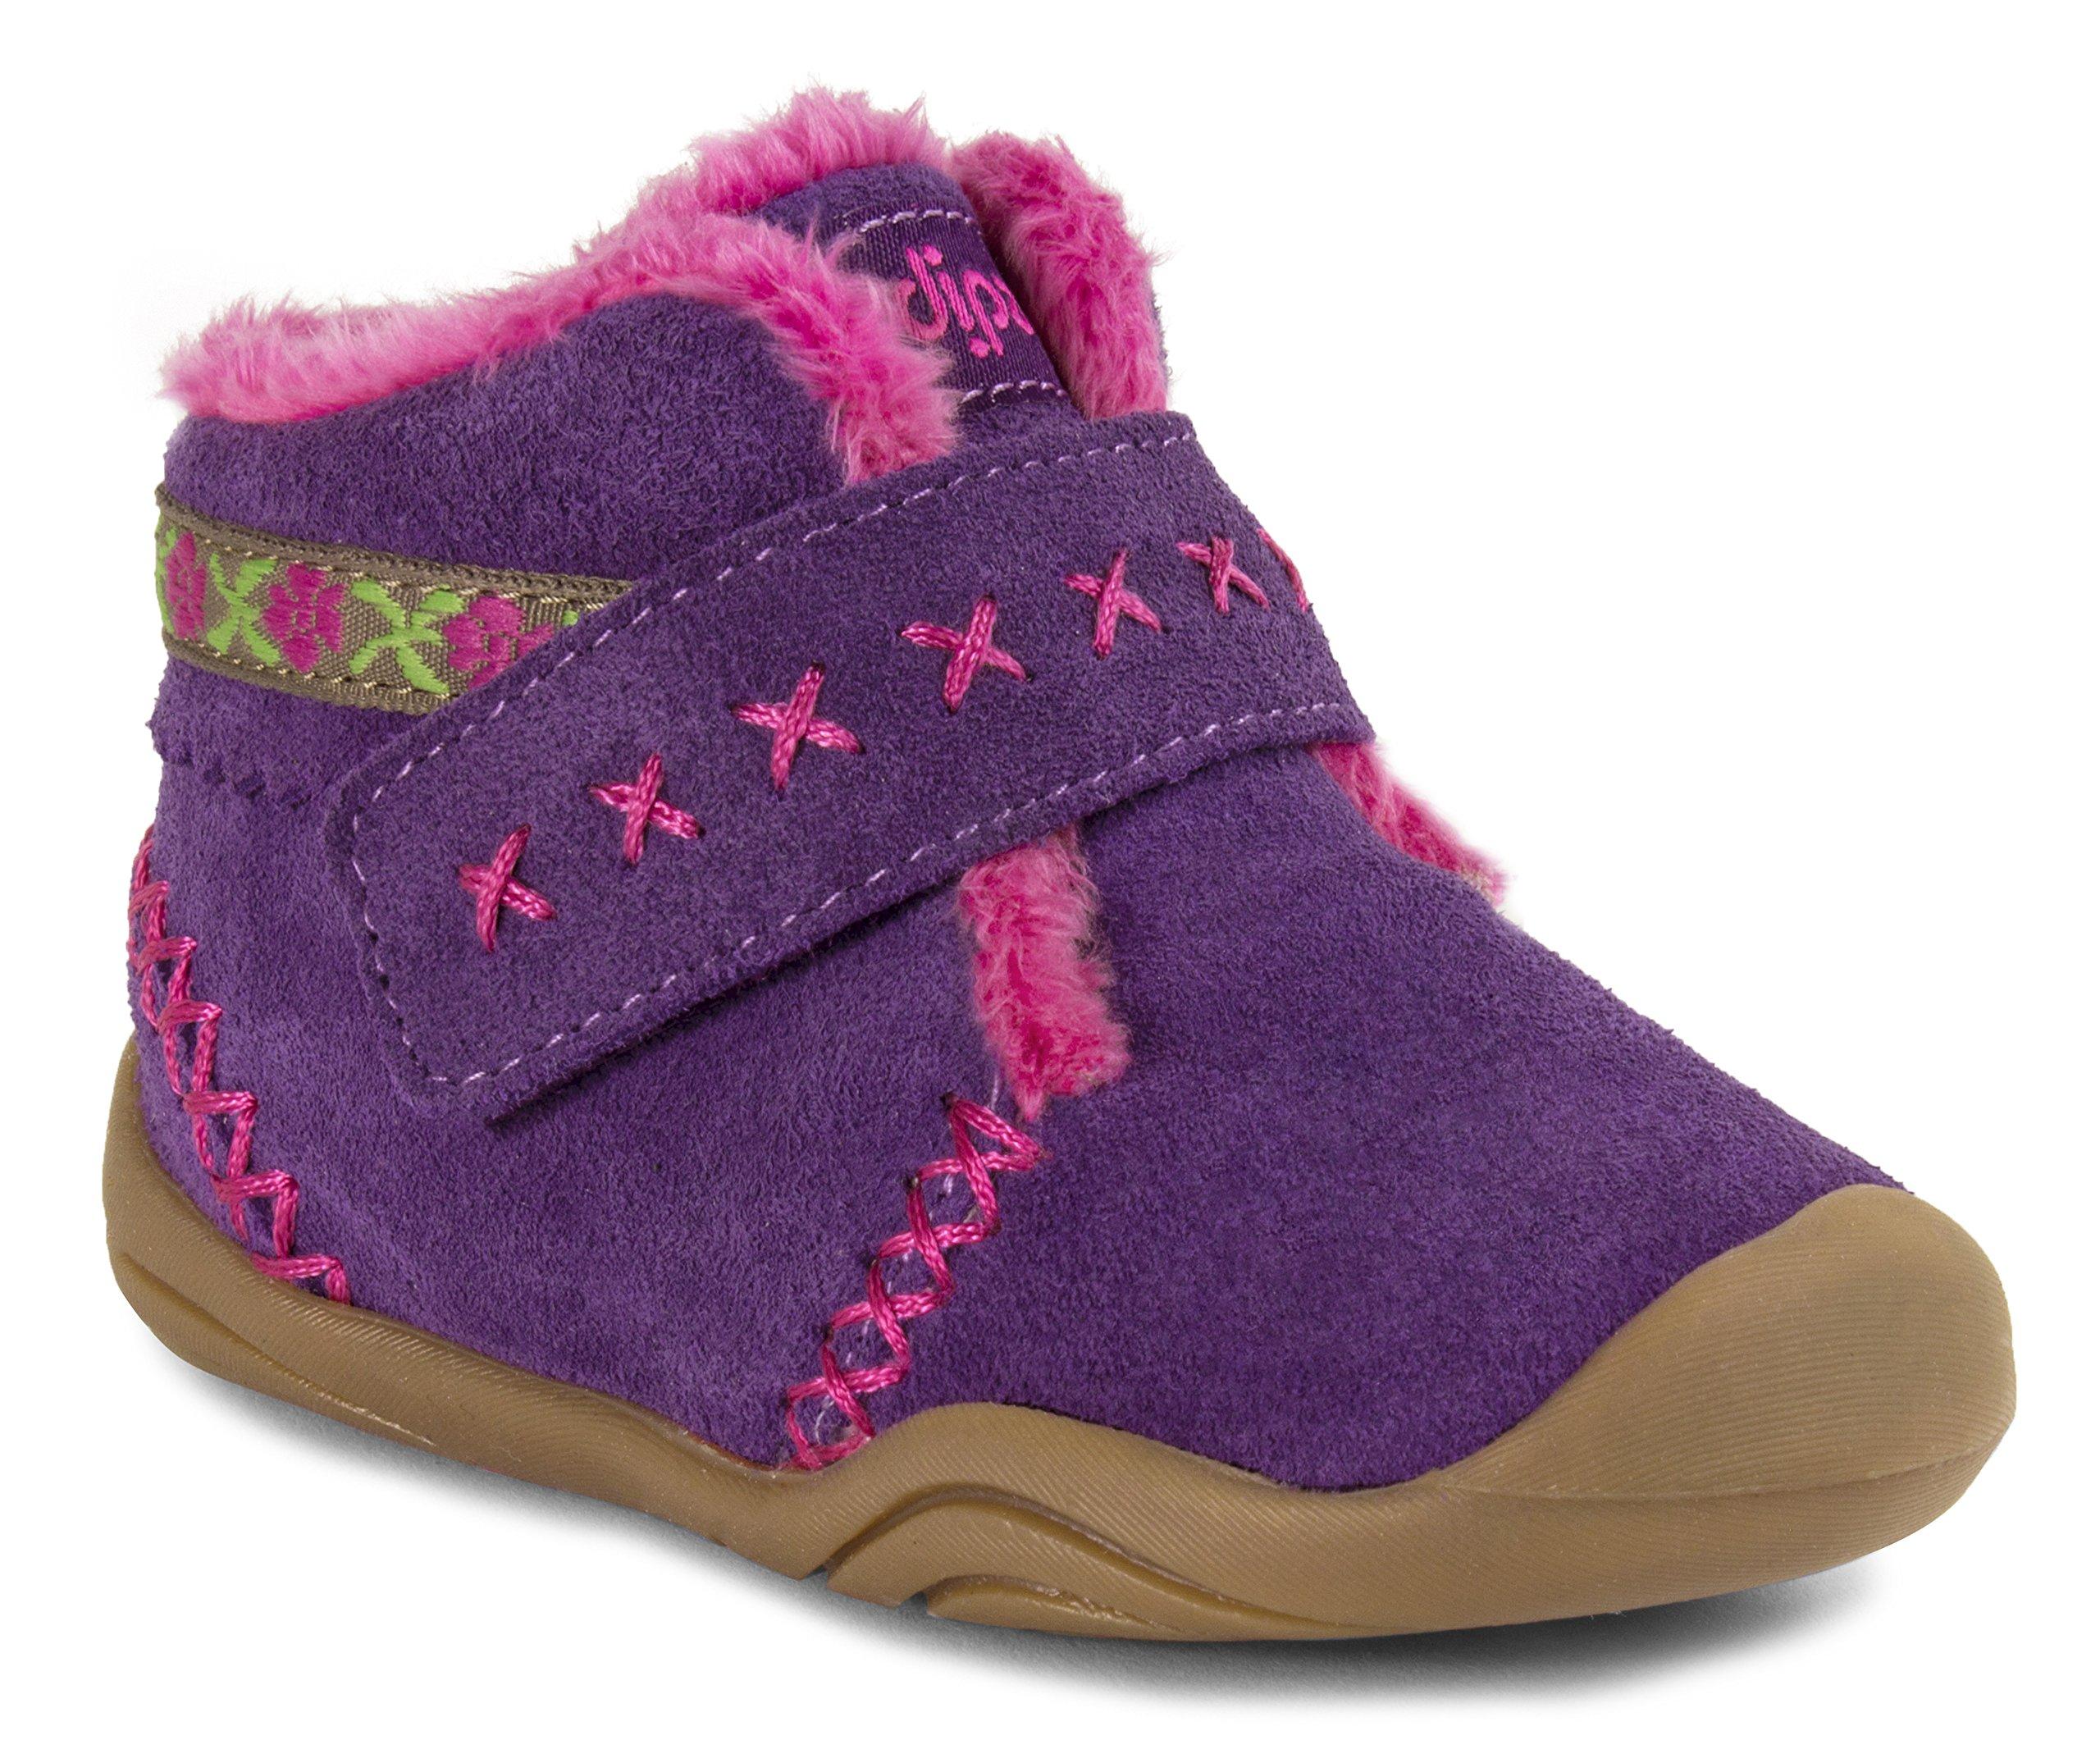 pediped Girls' Rosa Chukka, Purple, 20 EU(5 E US Toddler)